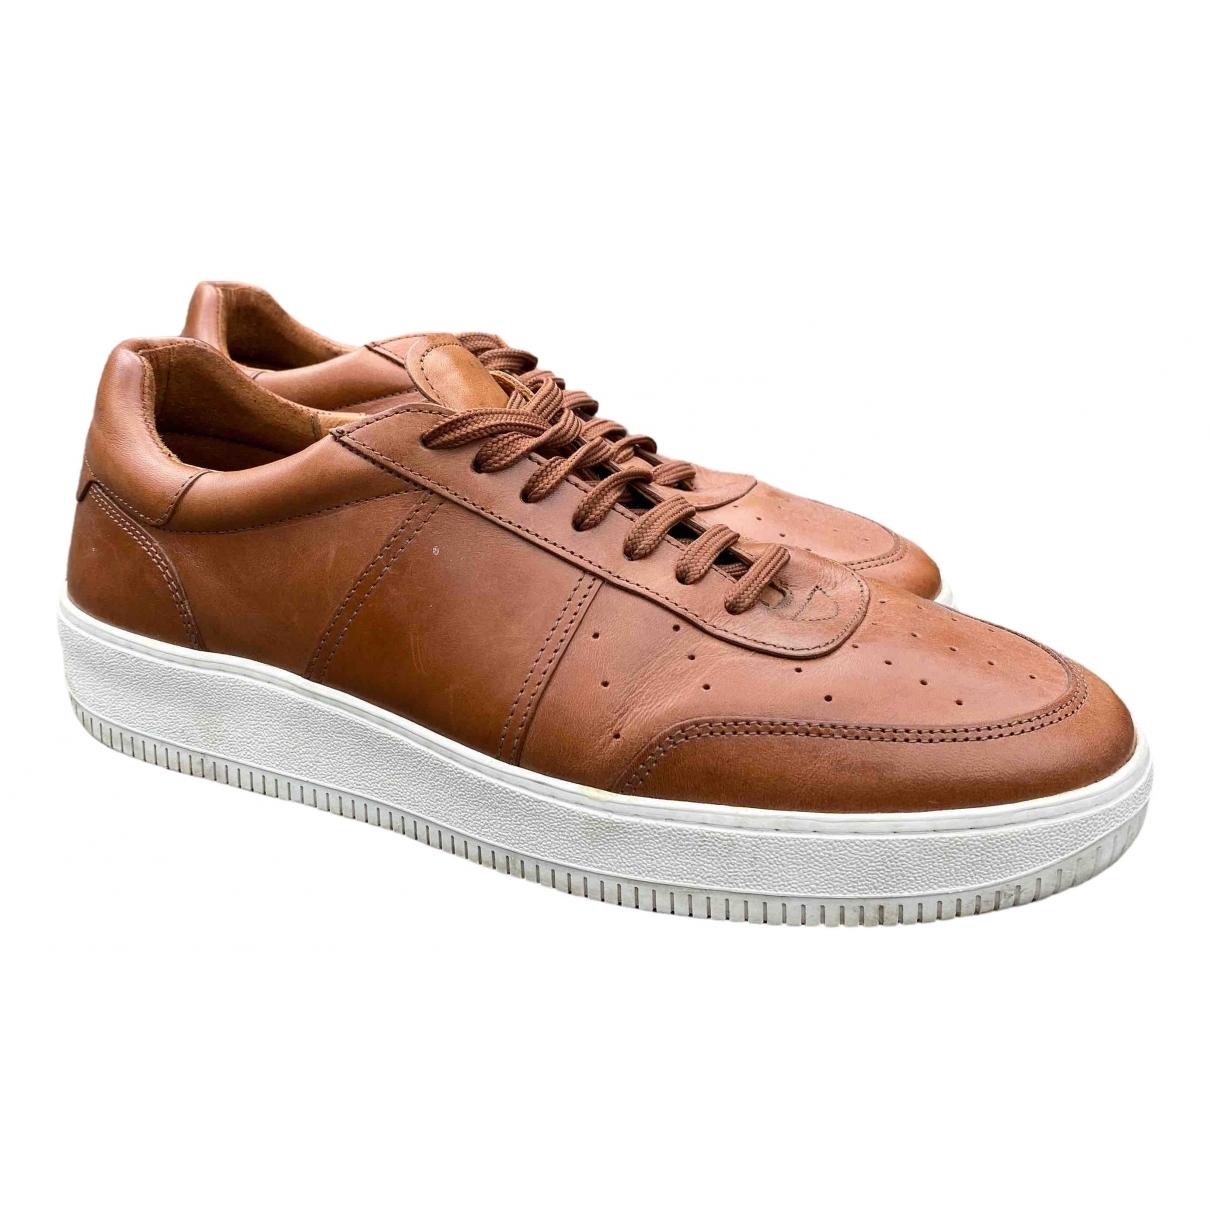 Sandro \N Sneakers in  Kamel Leder